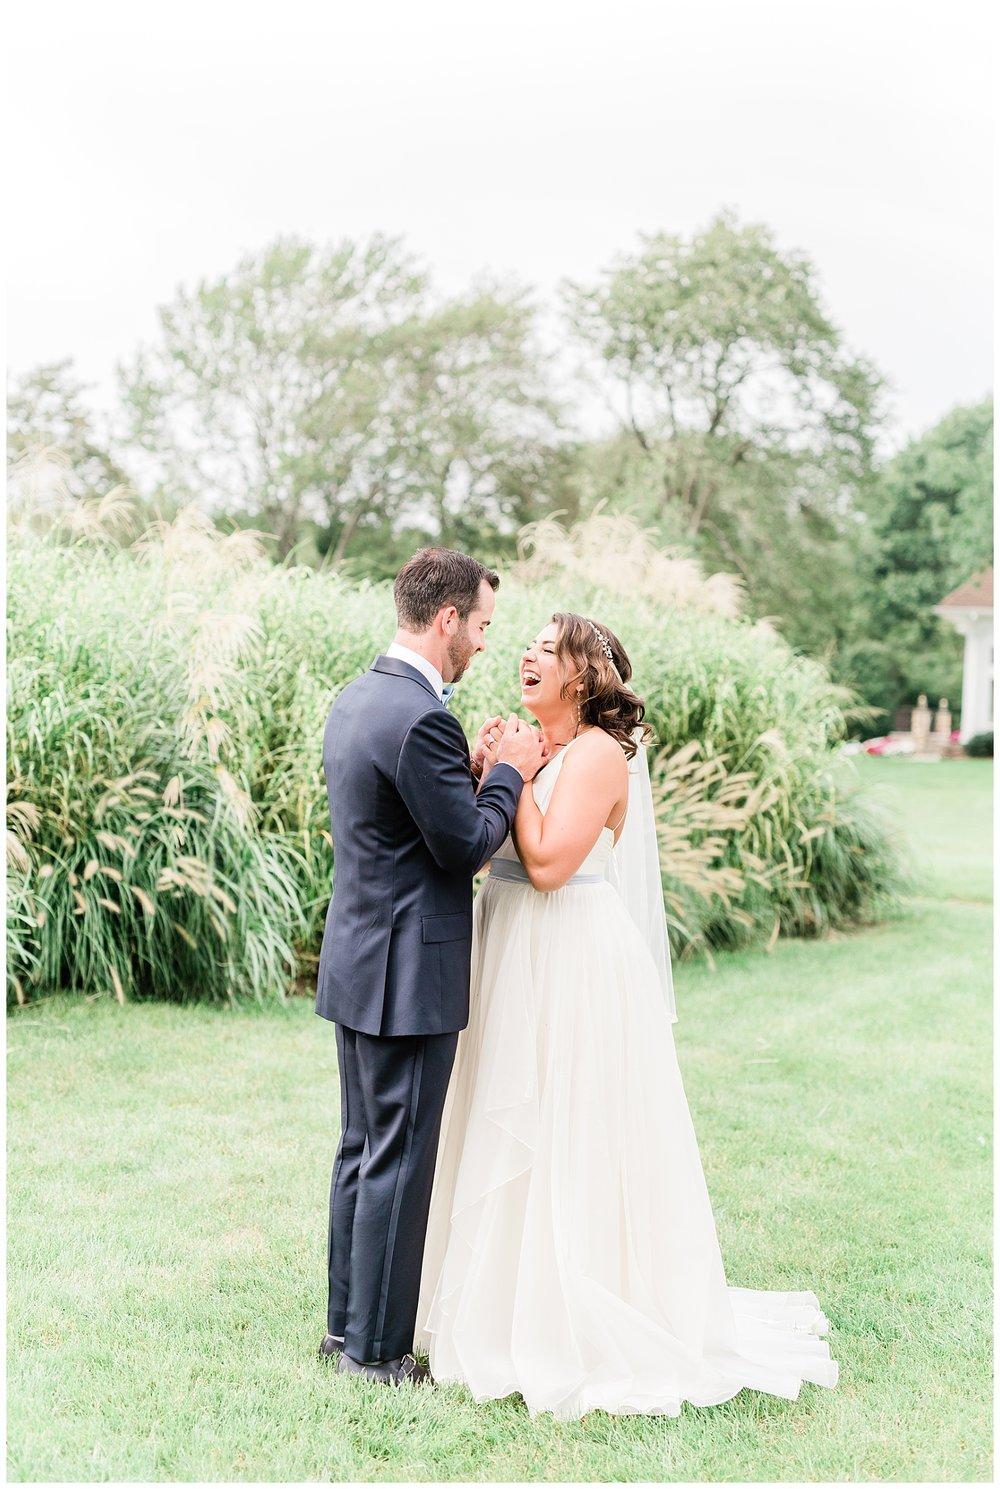 Indian-Trail-Club-Franklin-Lakes-NJ-Summer-Stylish-Wedding-Photographer-Photo-_0106.jpg